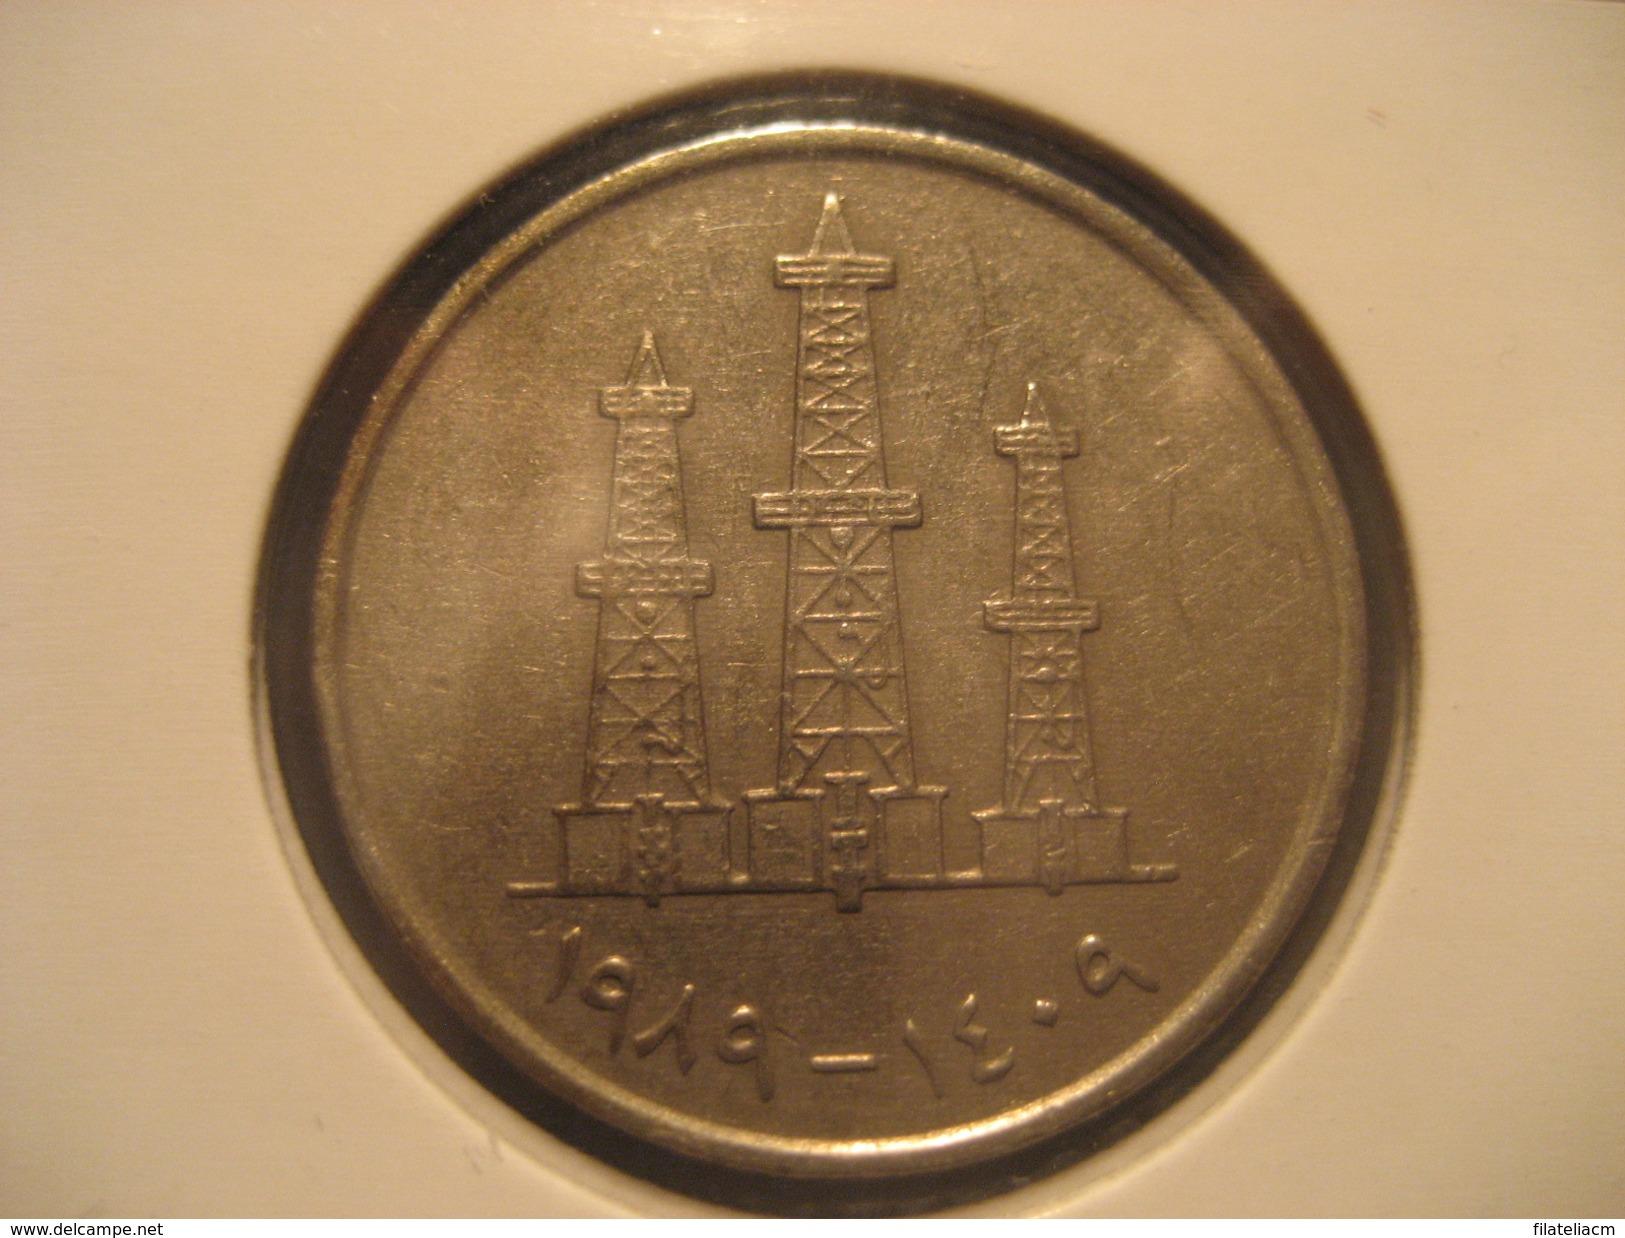 UAE United Arab Emirates Coin - Emirats Arabes Unis